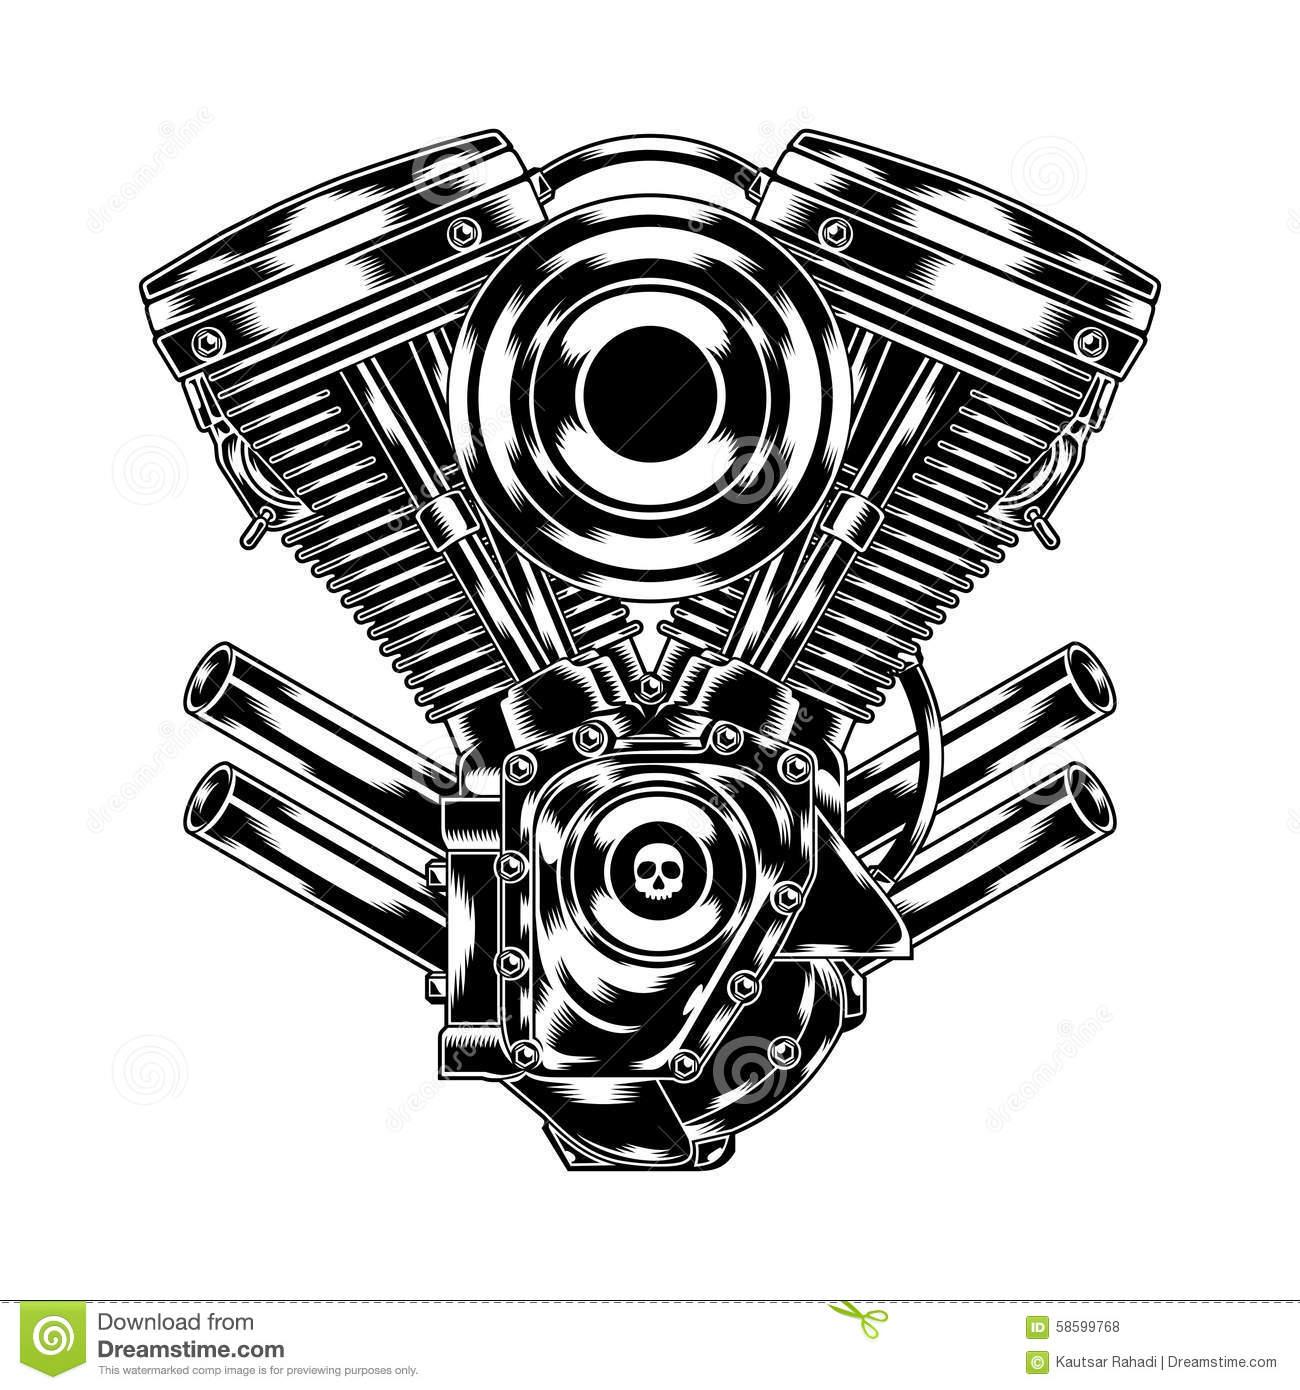 Engine Block Clipart